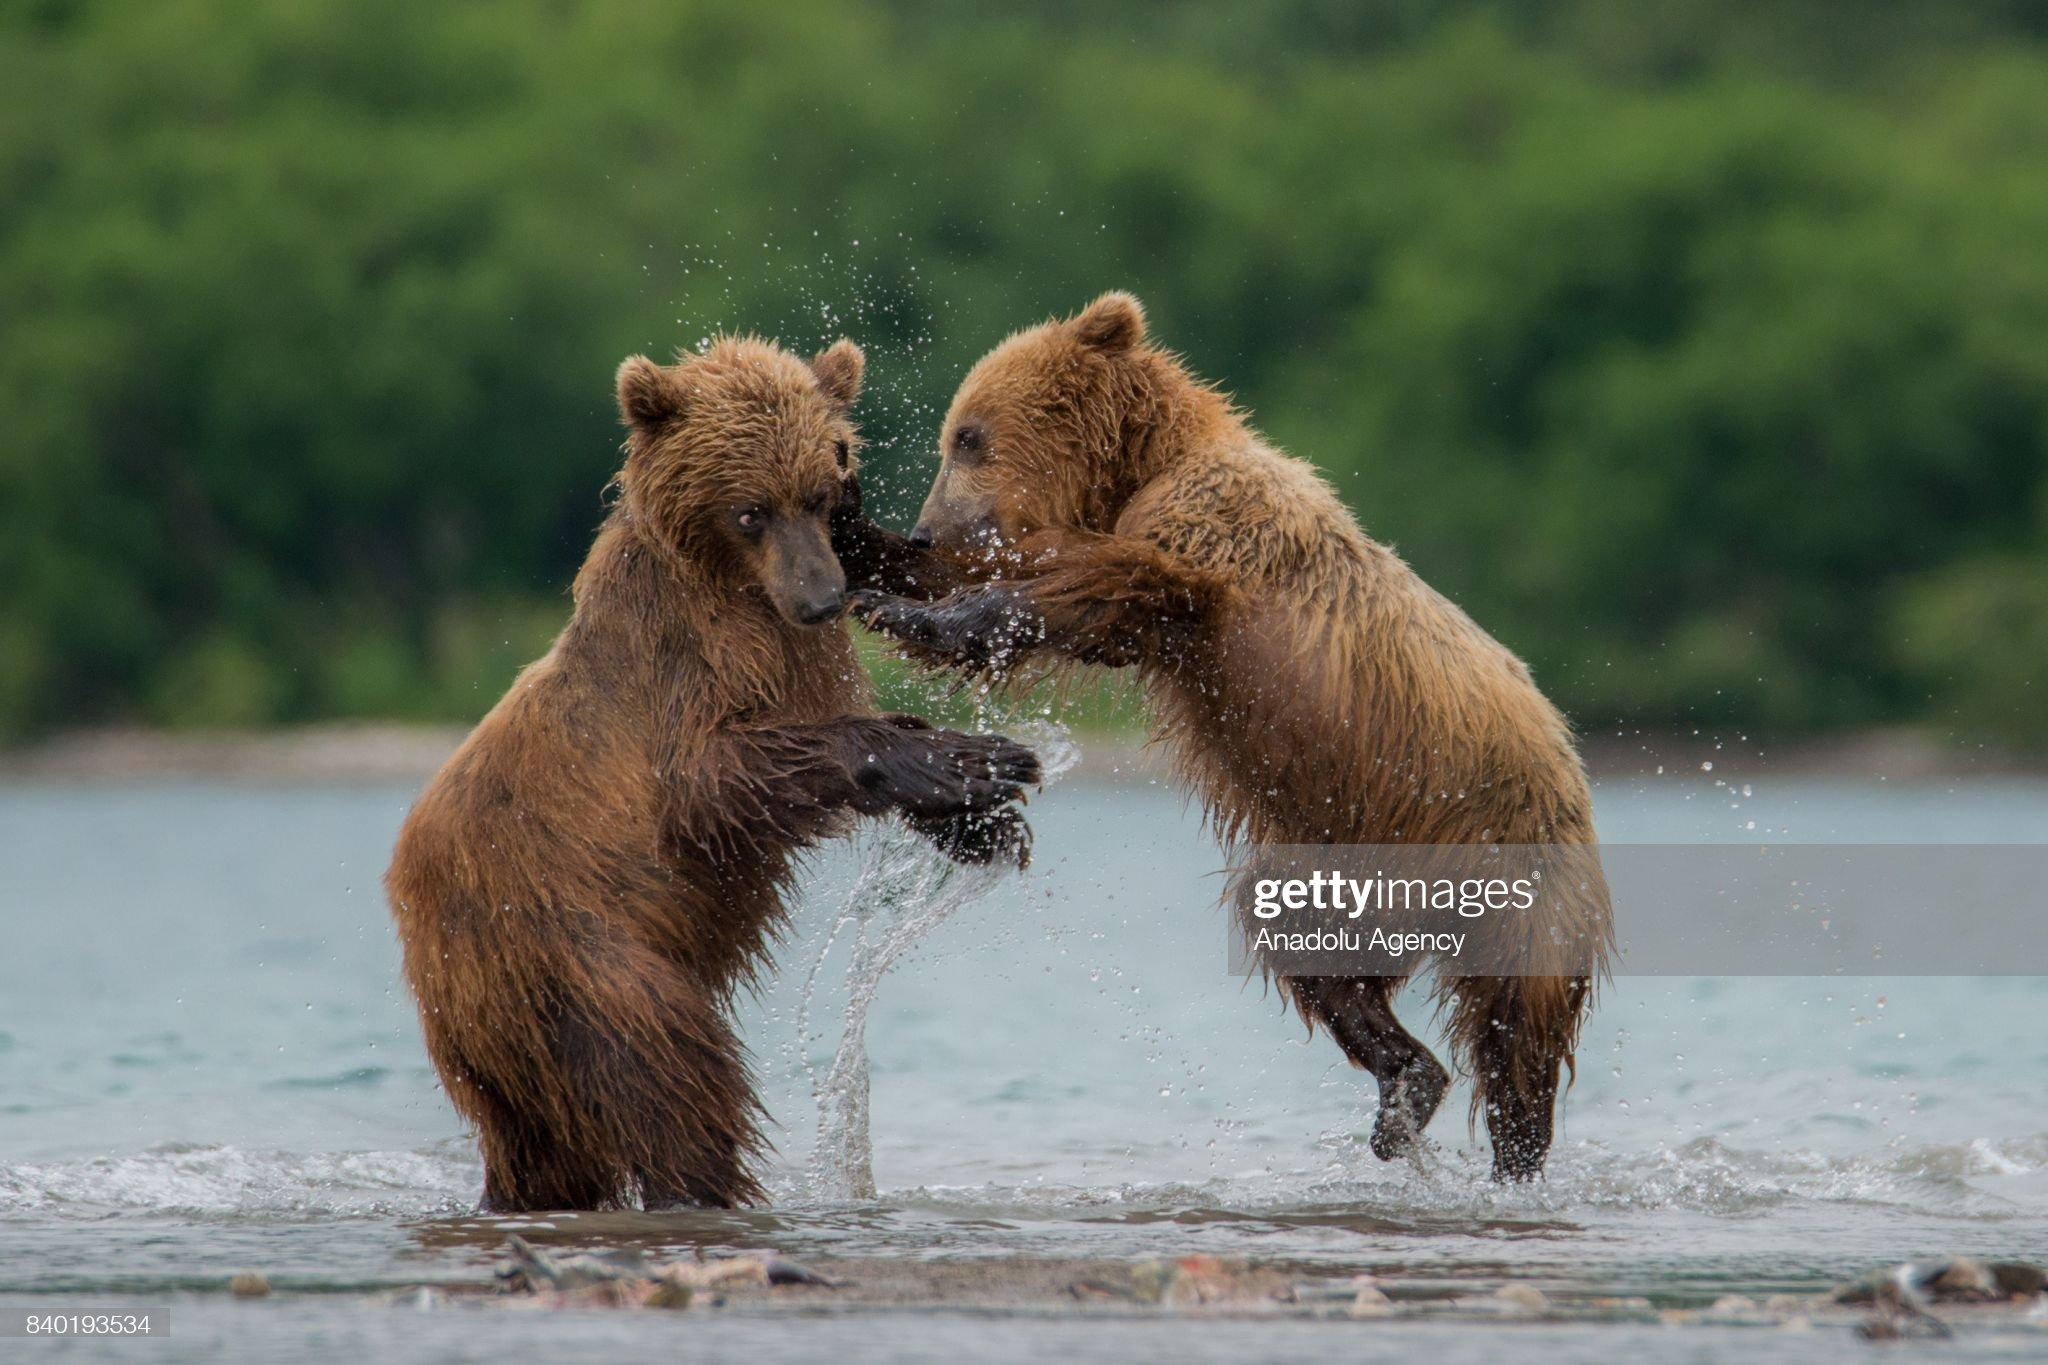 Kamchatka's brown bear life in Kamchatka : Foto di attualità